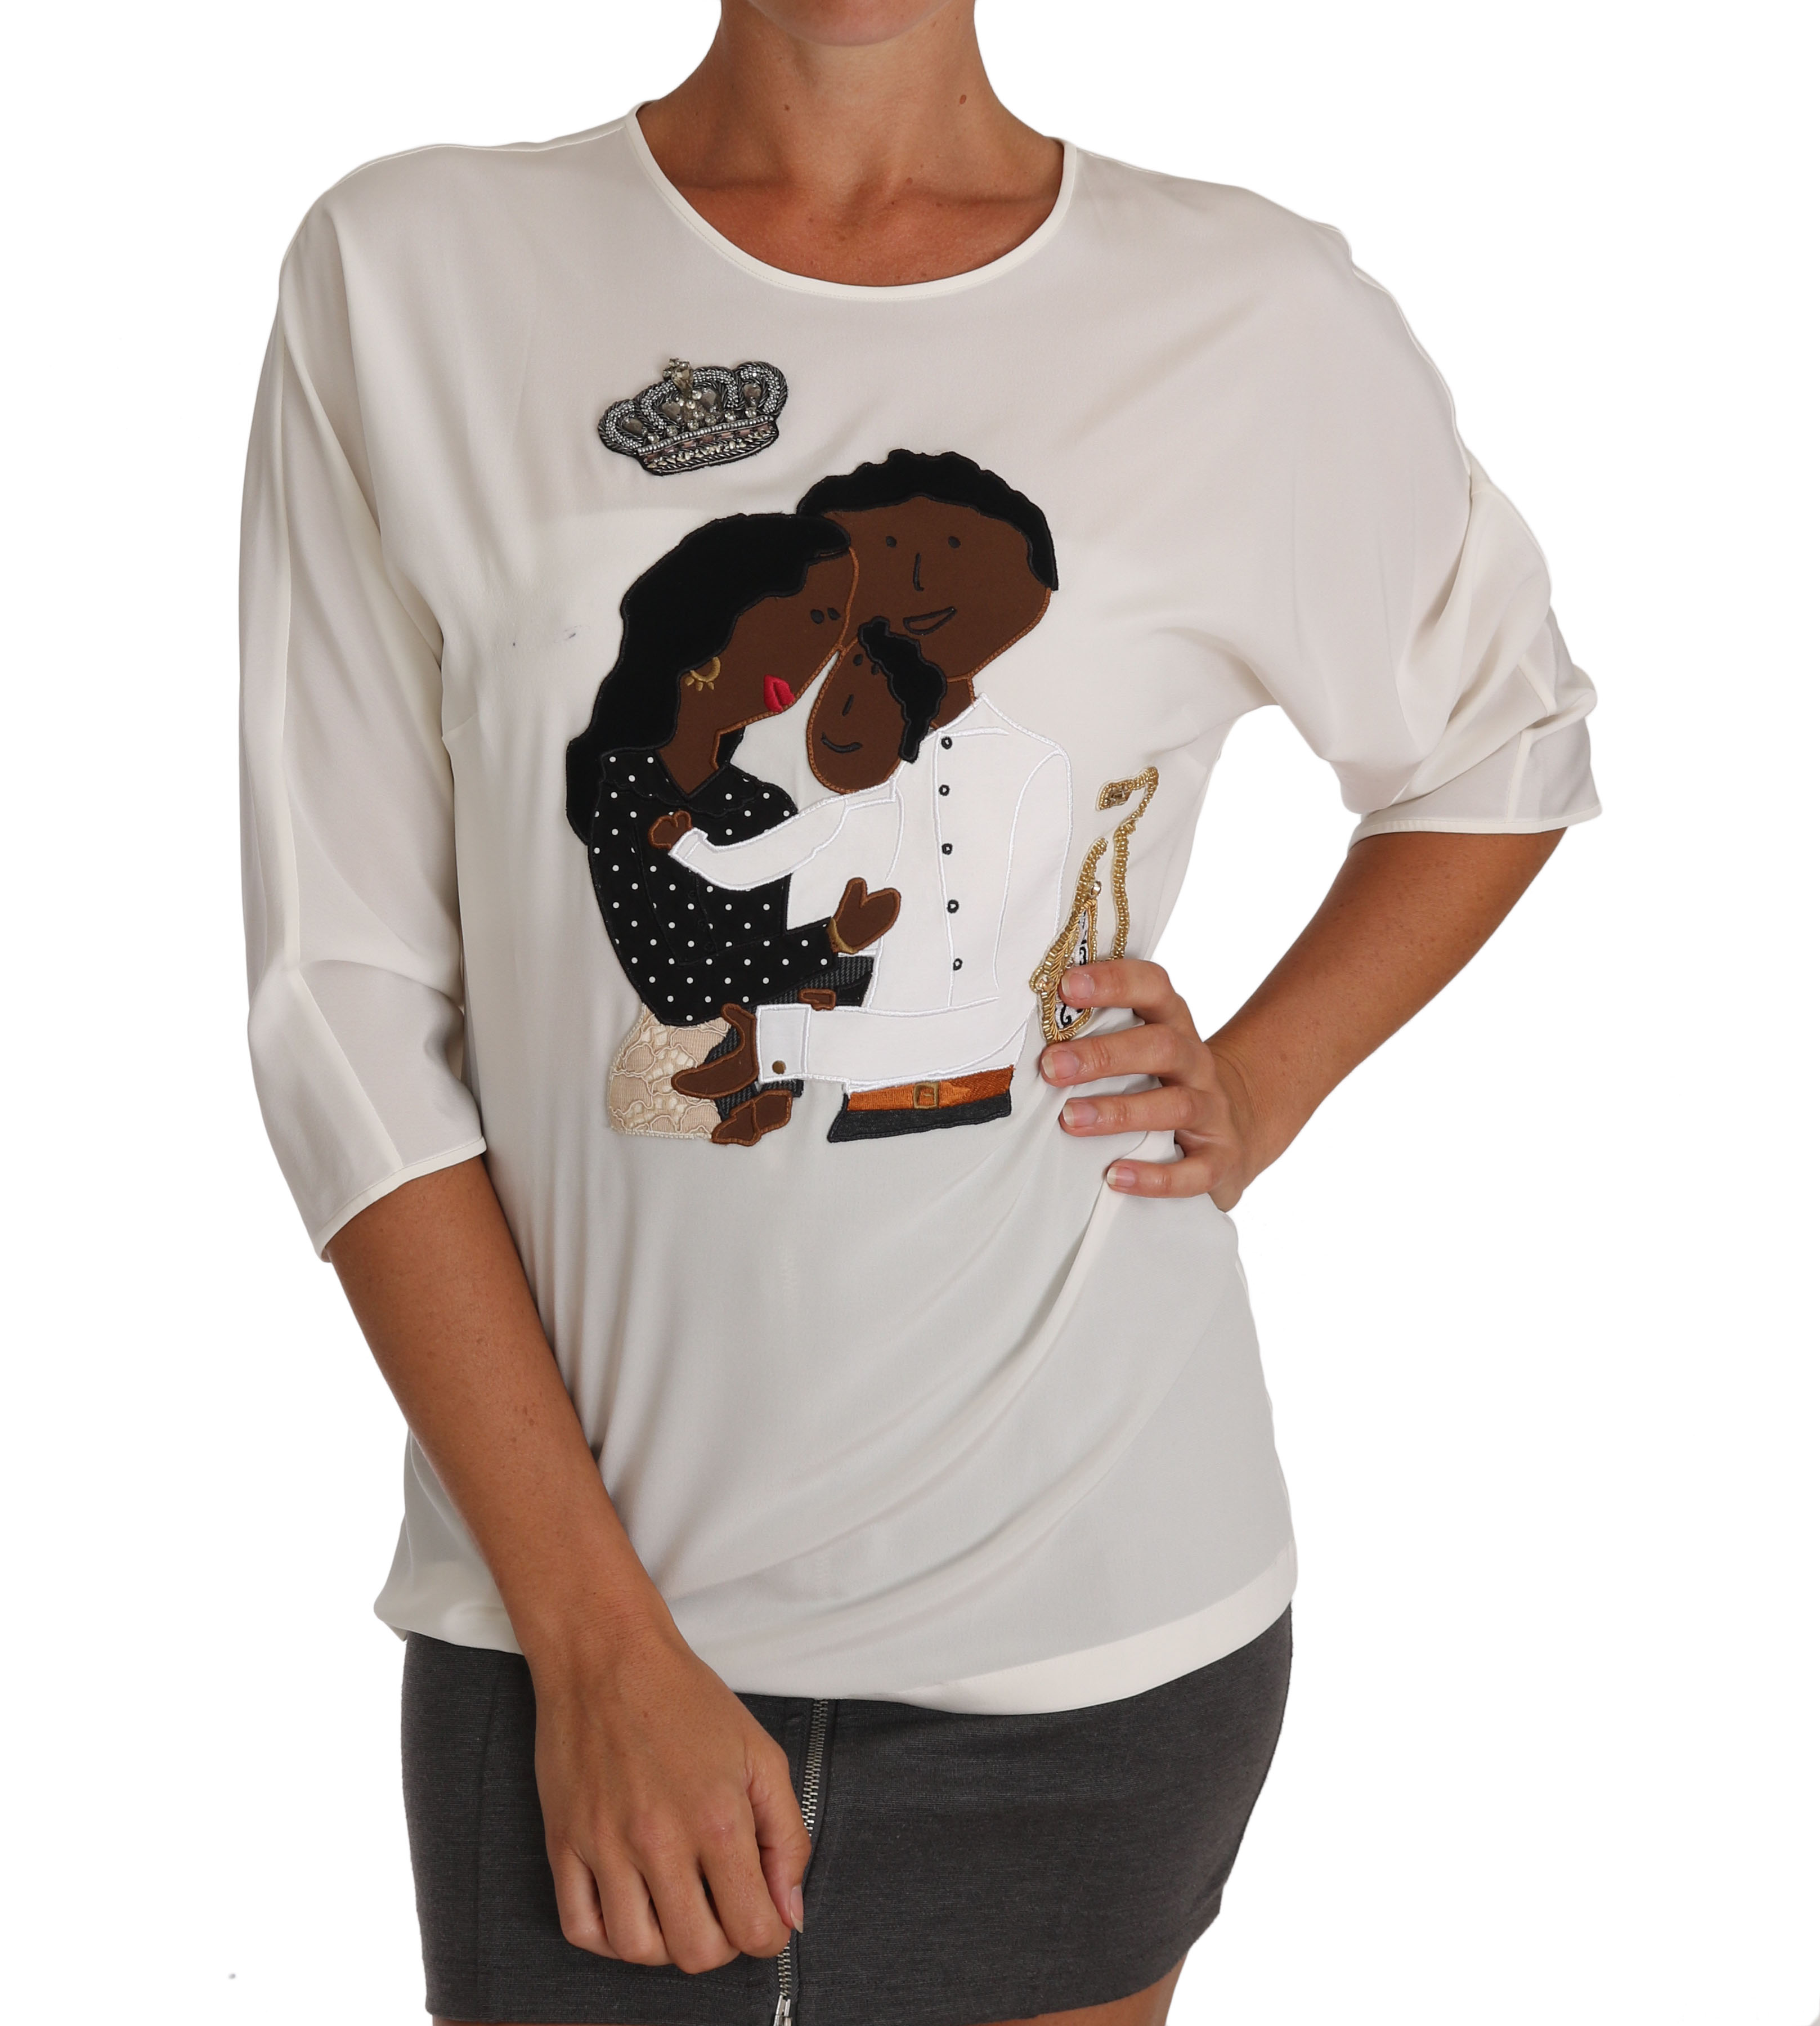 Dolce & Gabbana Women's Silk Crystal T-Shirts White TSH3368 - IT46|XL